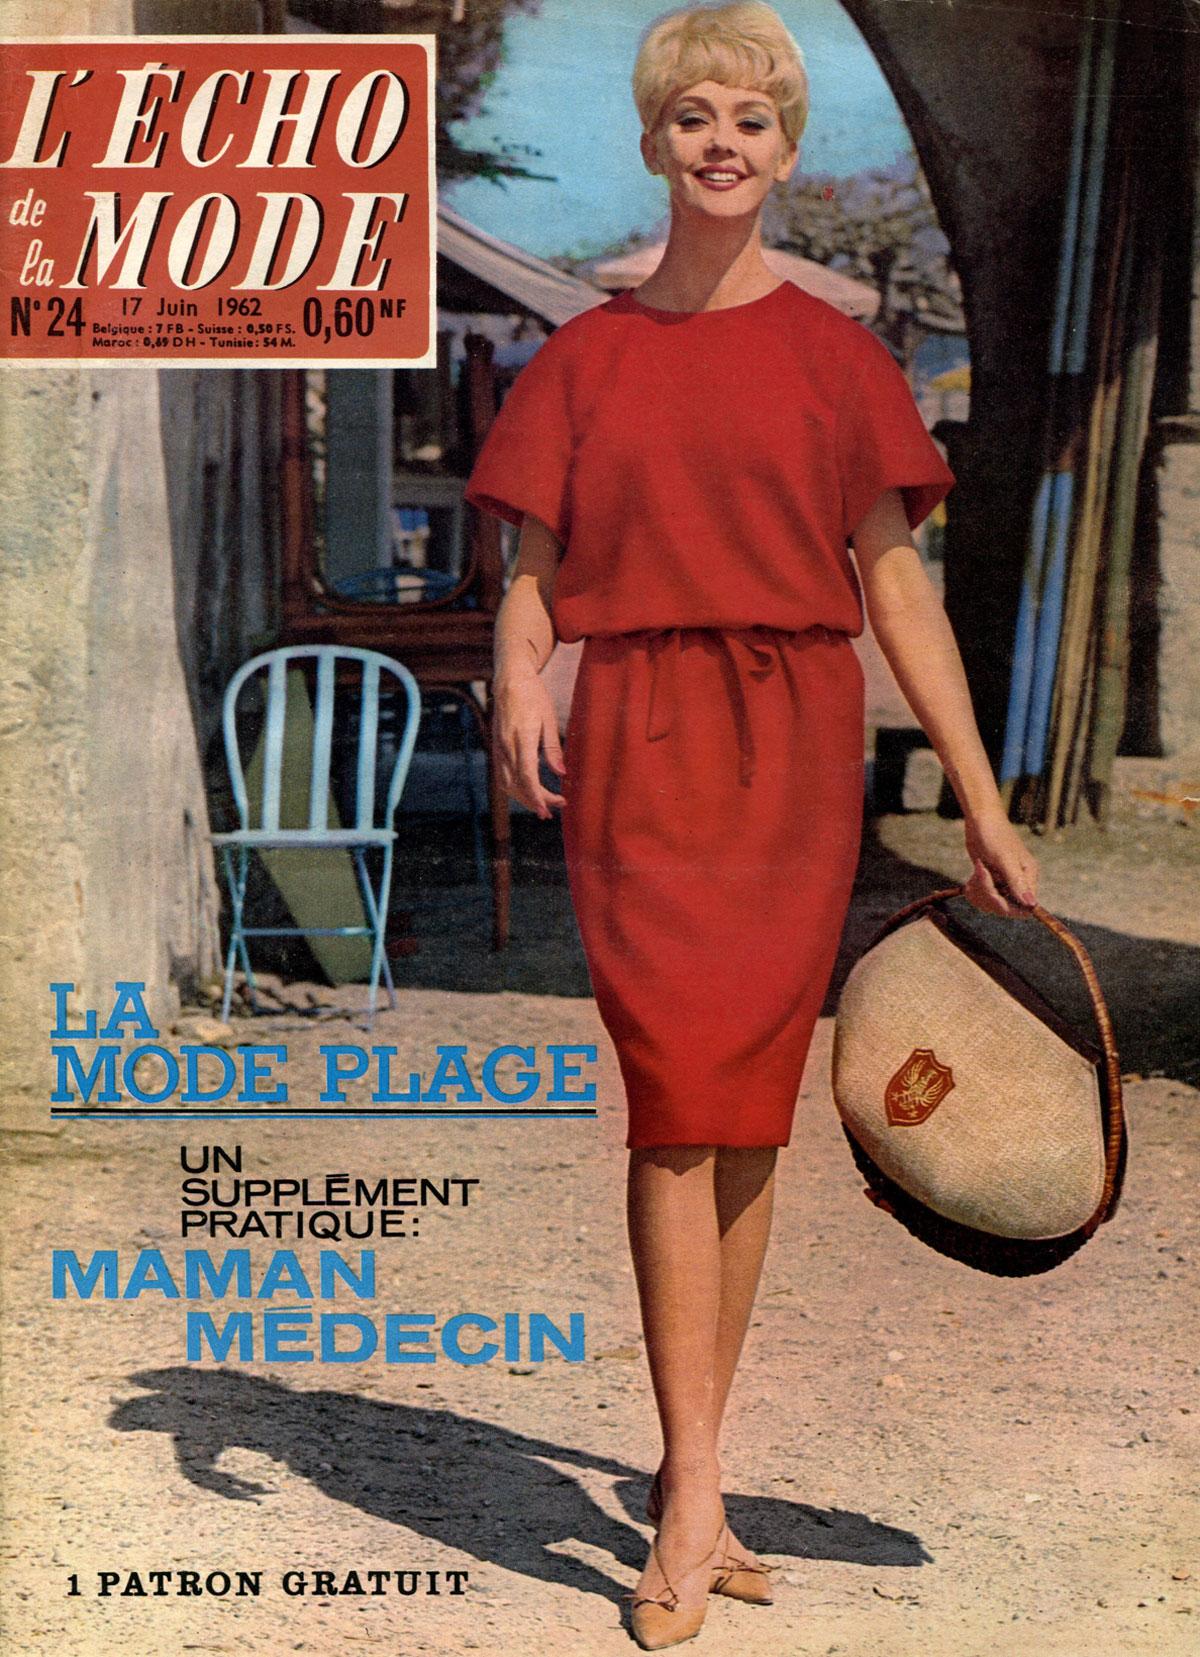 Echo de la Mode, №24, juin 1962